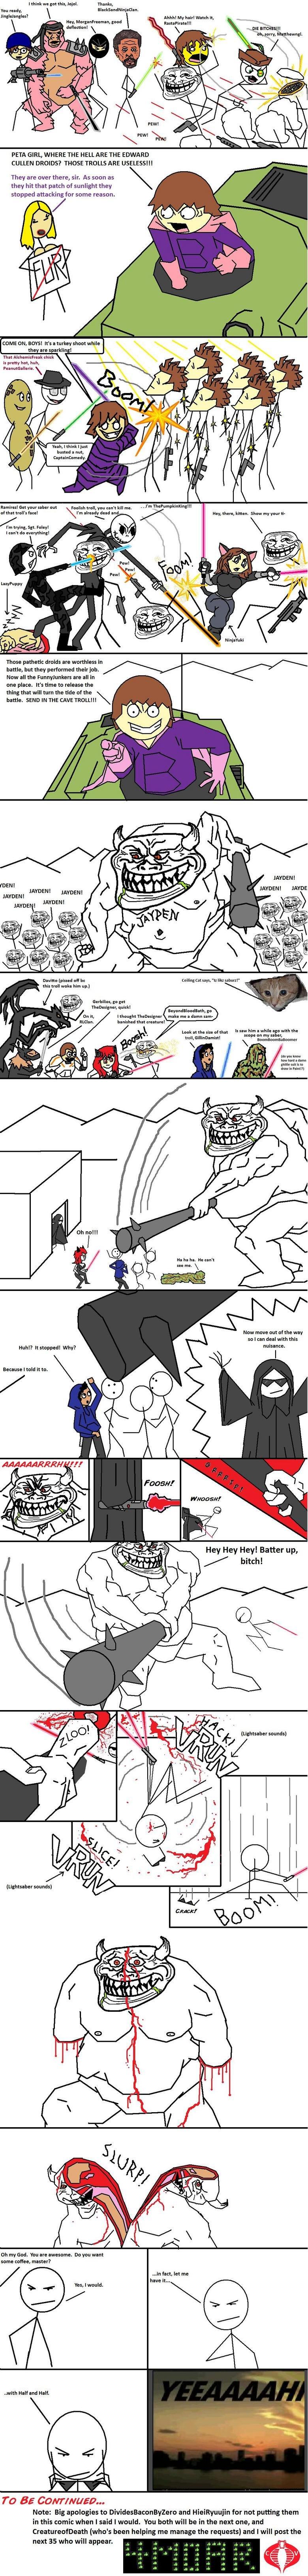 Epic Lightsaber Battle for FunnyJunk 2. Read the tags please.<br /> For #1:<br /> www.funnyjunk.com/funny_pictures/410140/Epic+Lightsaber+Battle+at+